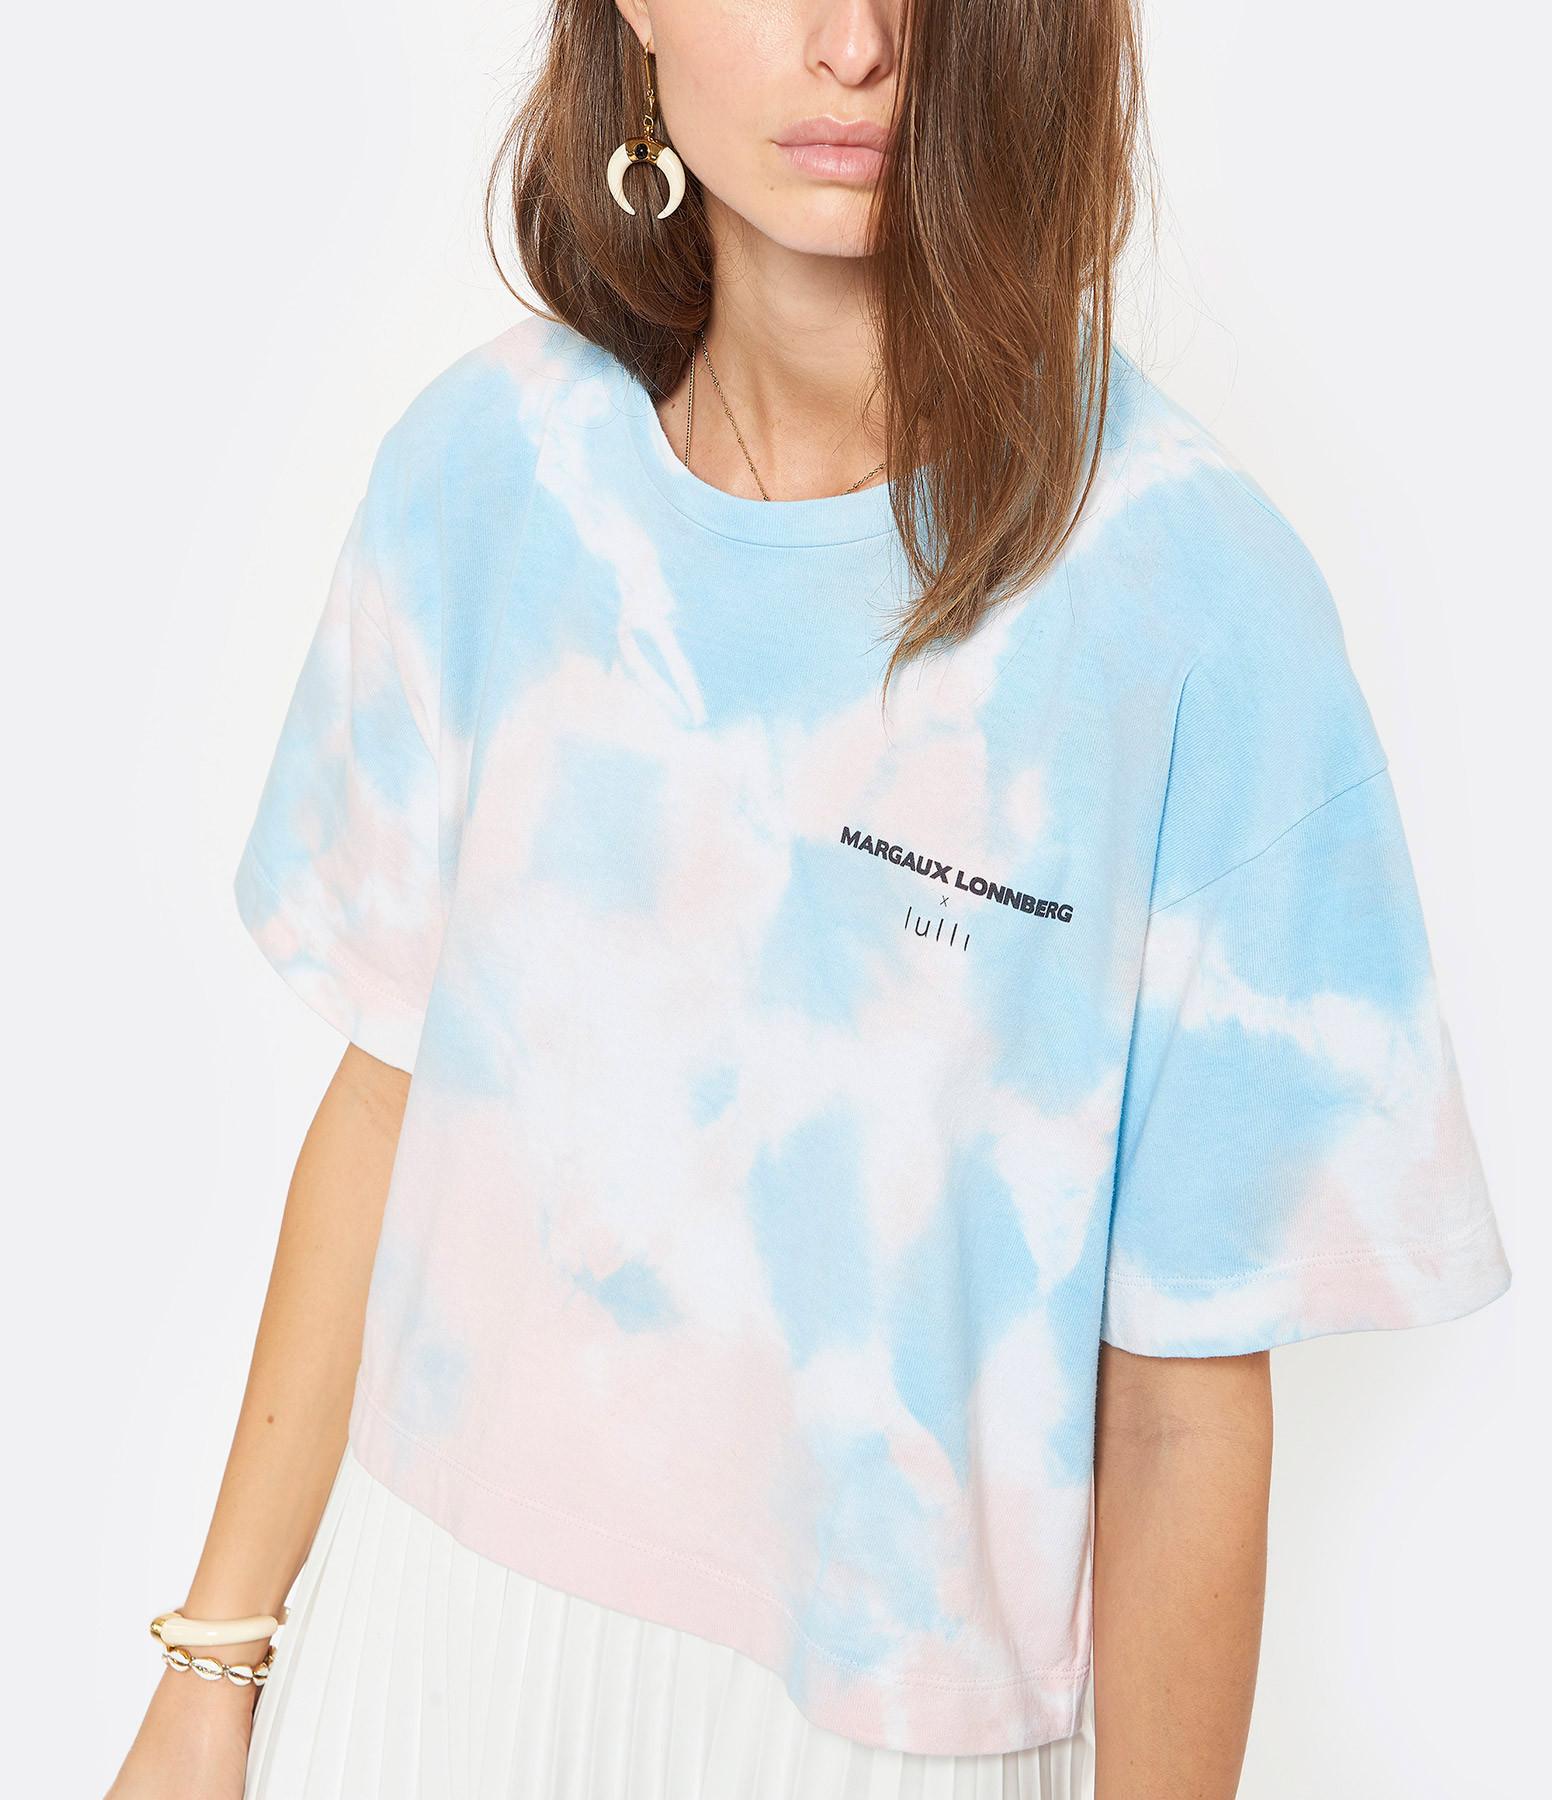 MARGAUX LONNBERG - Tee-shirt Brisa Coton Tie & dye, Exclusivité Lulli